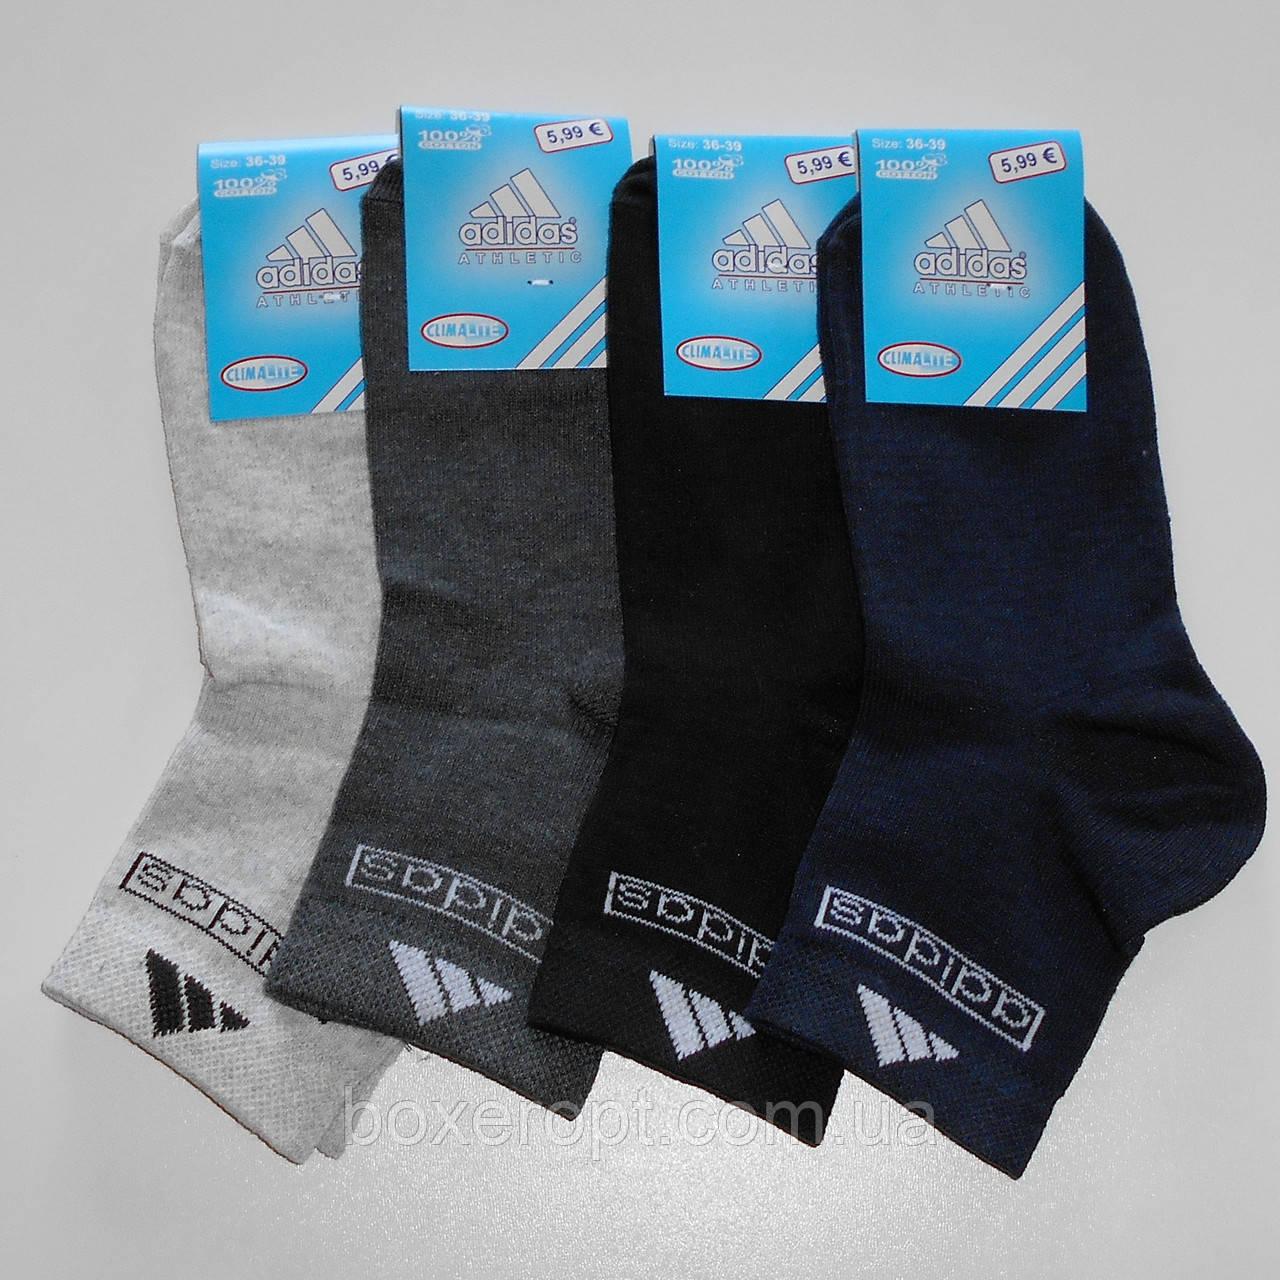 Женские носки Adidas - 7.00 грн./пара (темное ассорти)